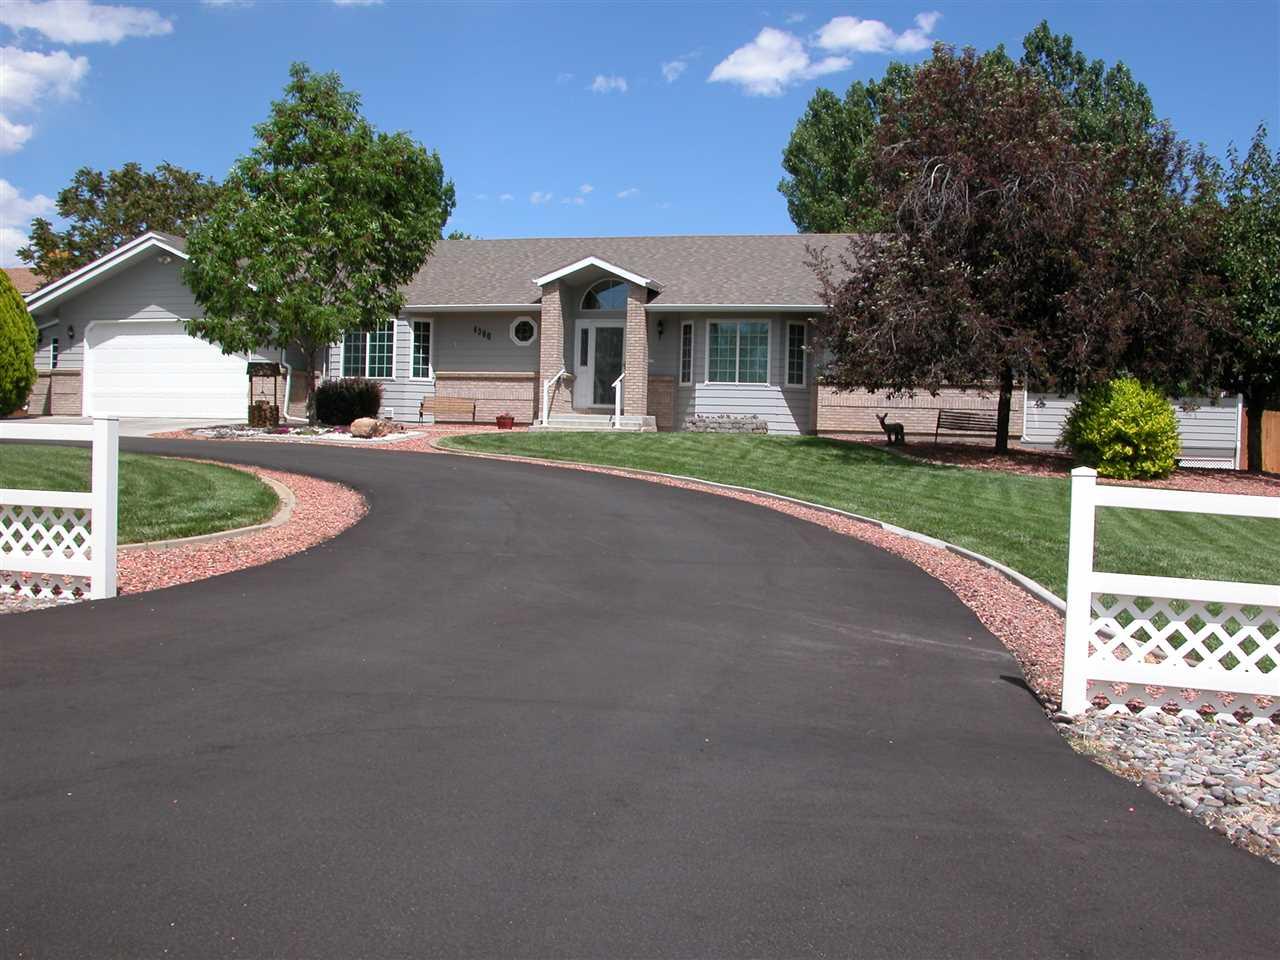 4300 27 1/2 Court, Grand Junction, CO 81506